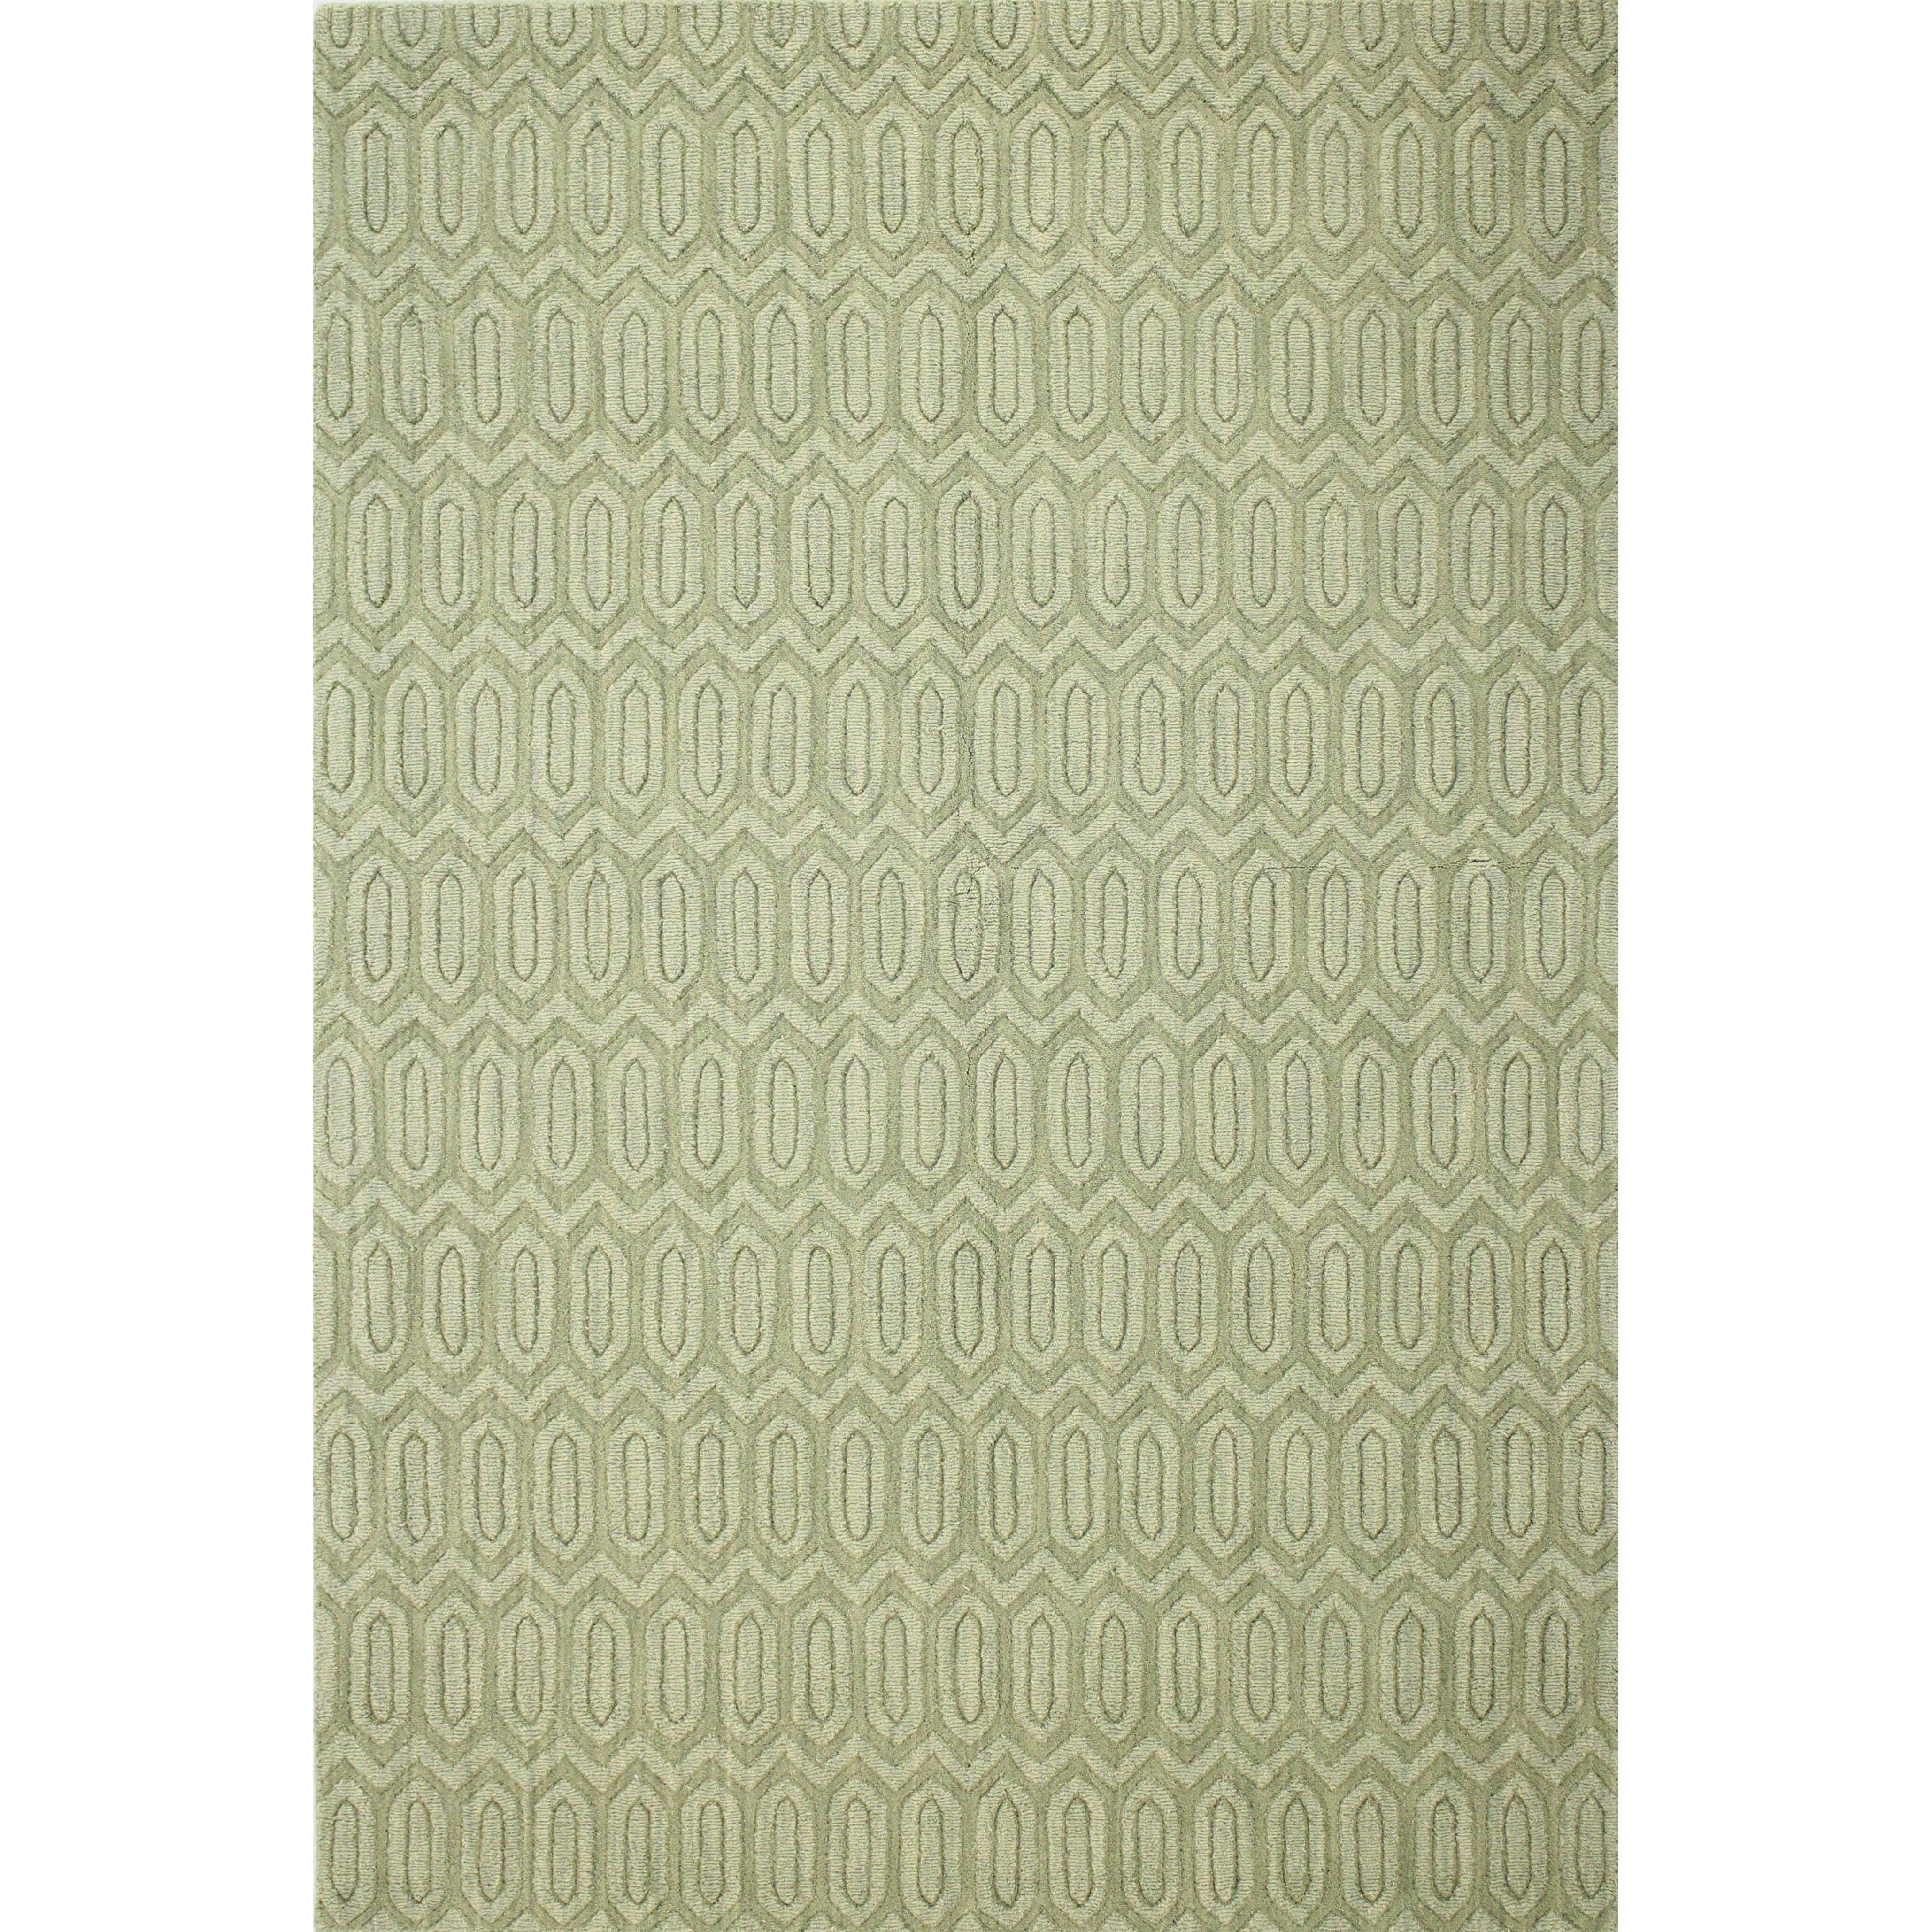 Green Rugs Next: Mercury Row Marrakesh Light Green Area Rug & Reviews